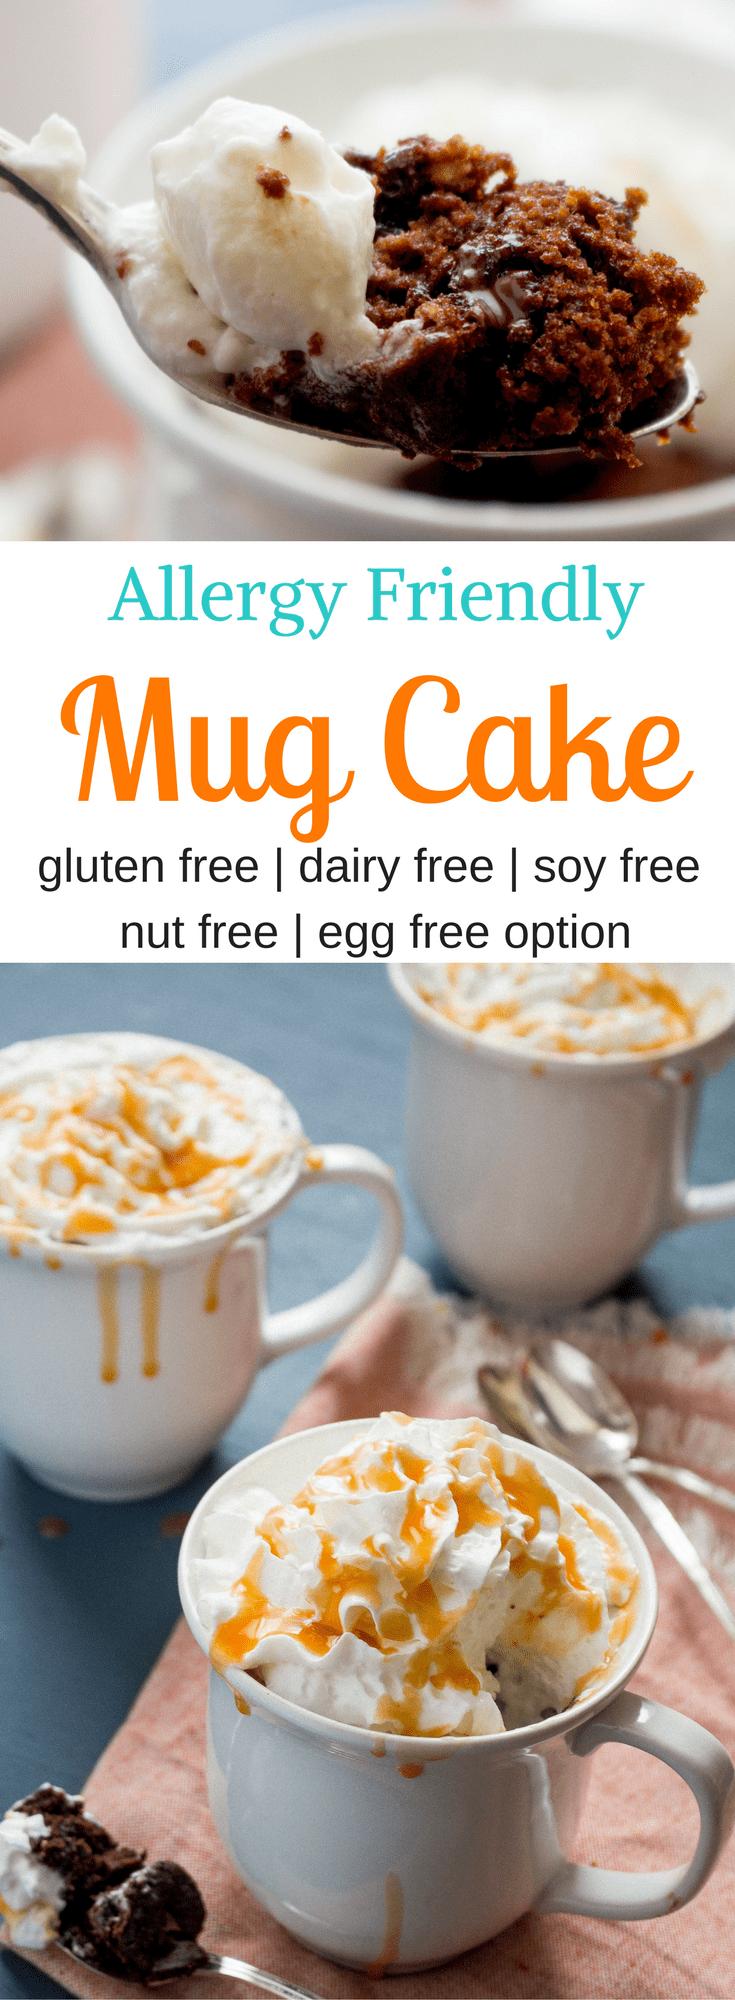 Allergy Friendly Mug Cake With Ryze Gluten Free Flour